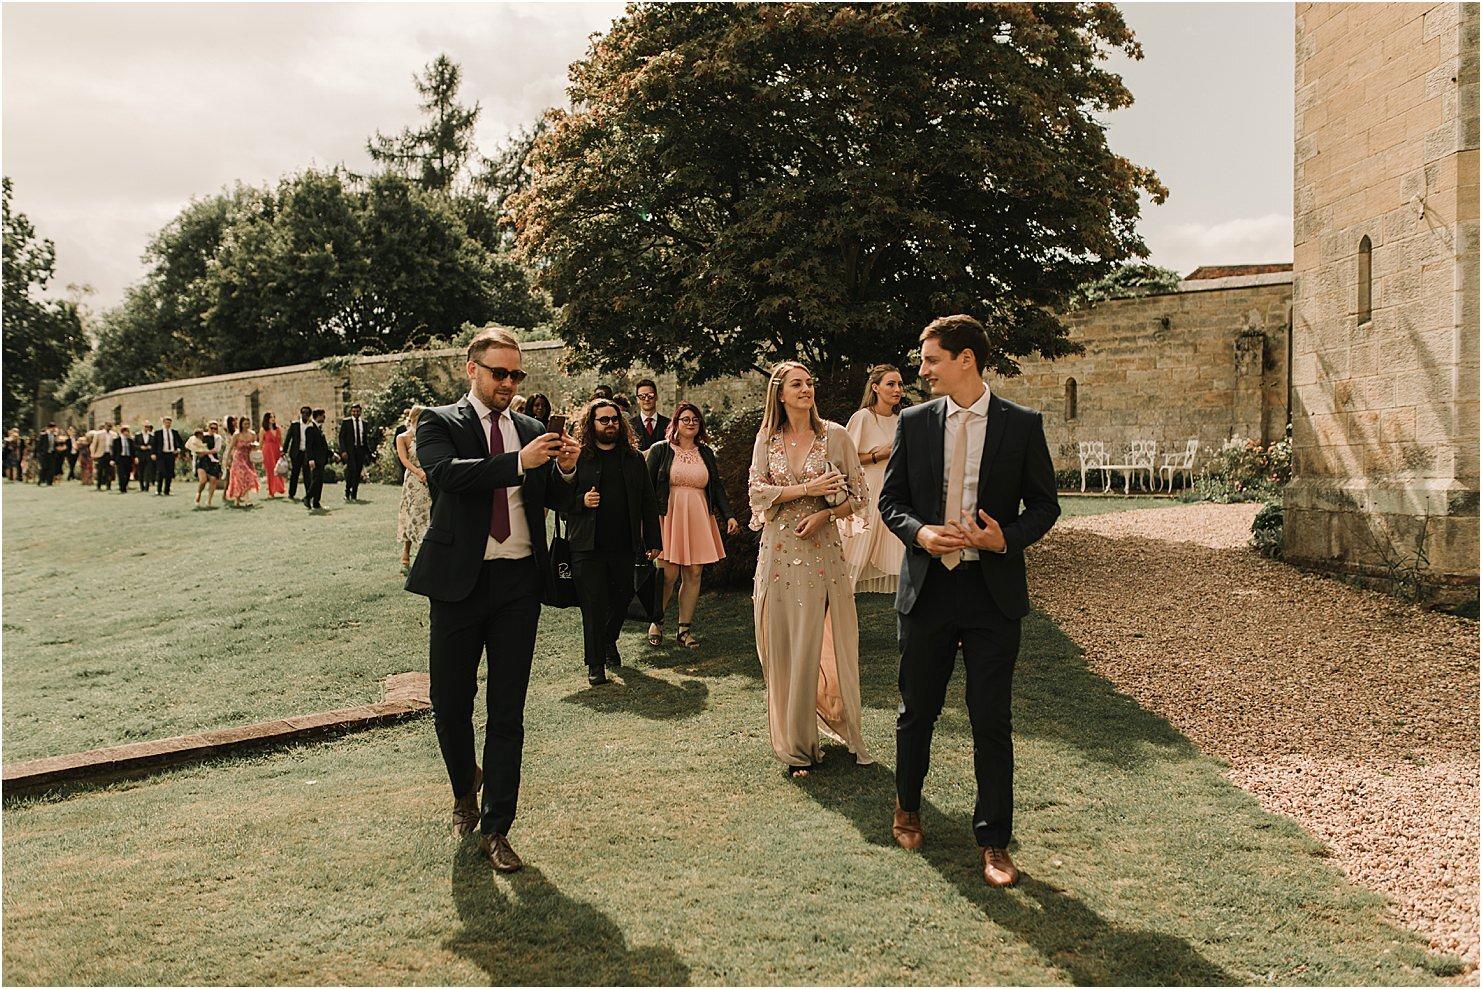 boda-de-cuento-en-castillo-boda-en-londres-60.jpg